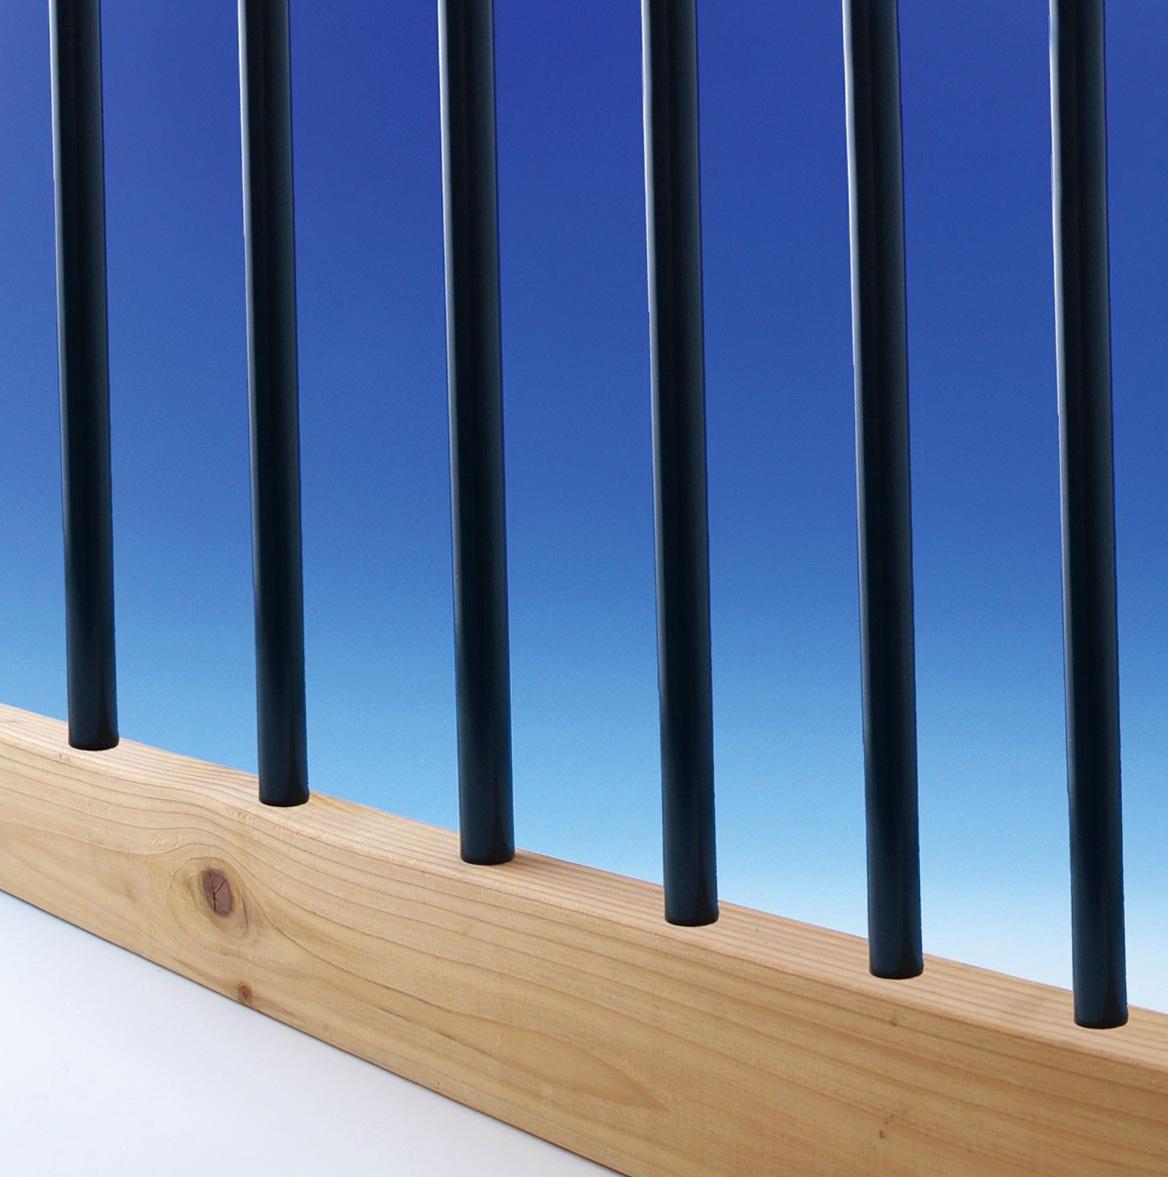 Aluminum Deck Balusters Lowes